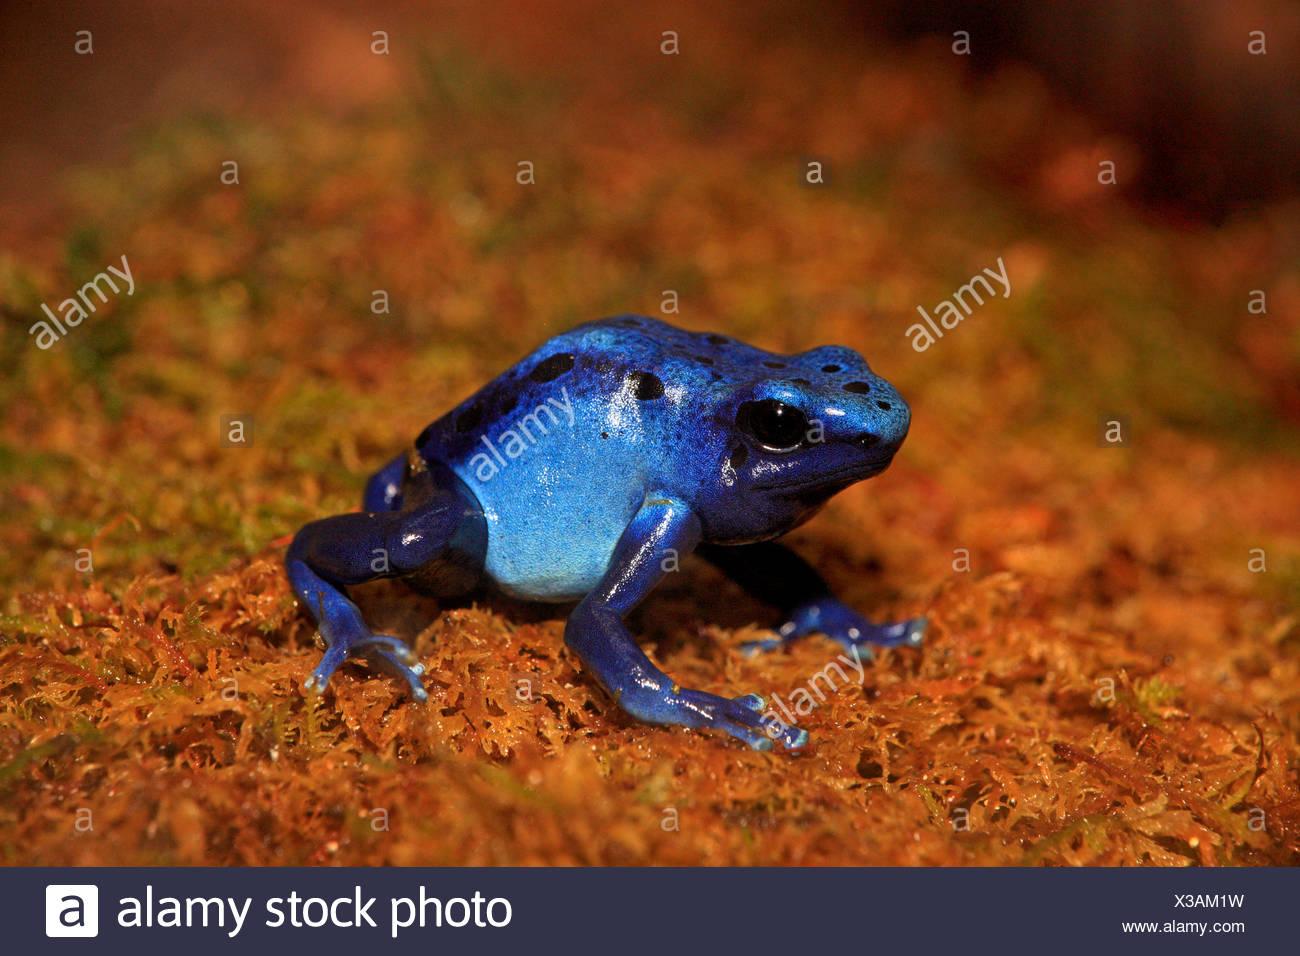 Blue poison dart frog, on shore, South America / (Dendrobates tinctorius) - Stock Image